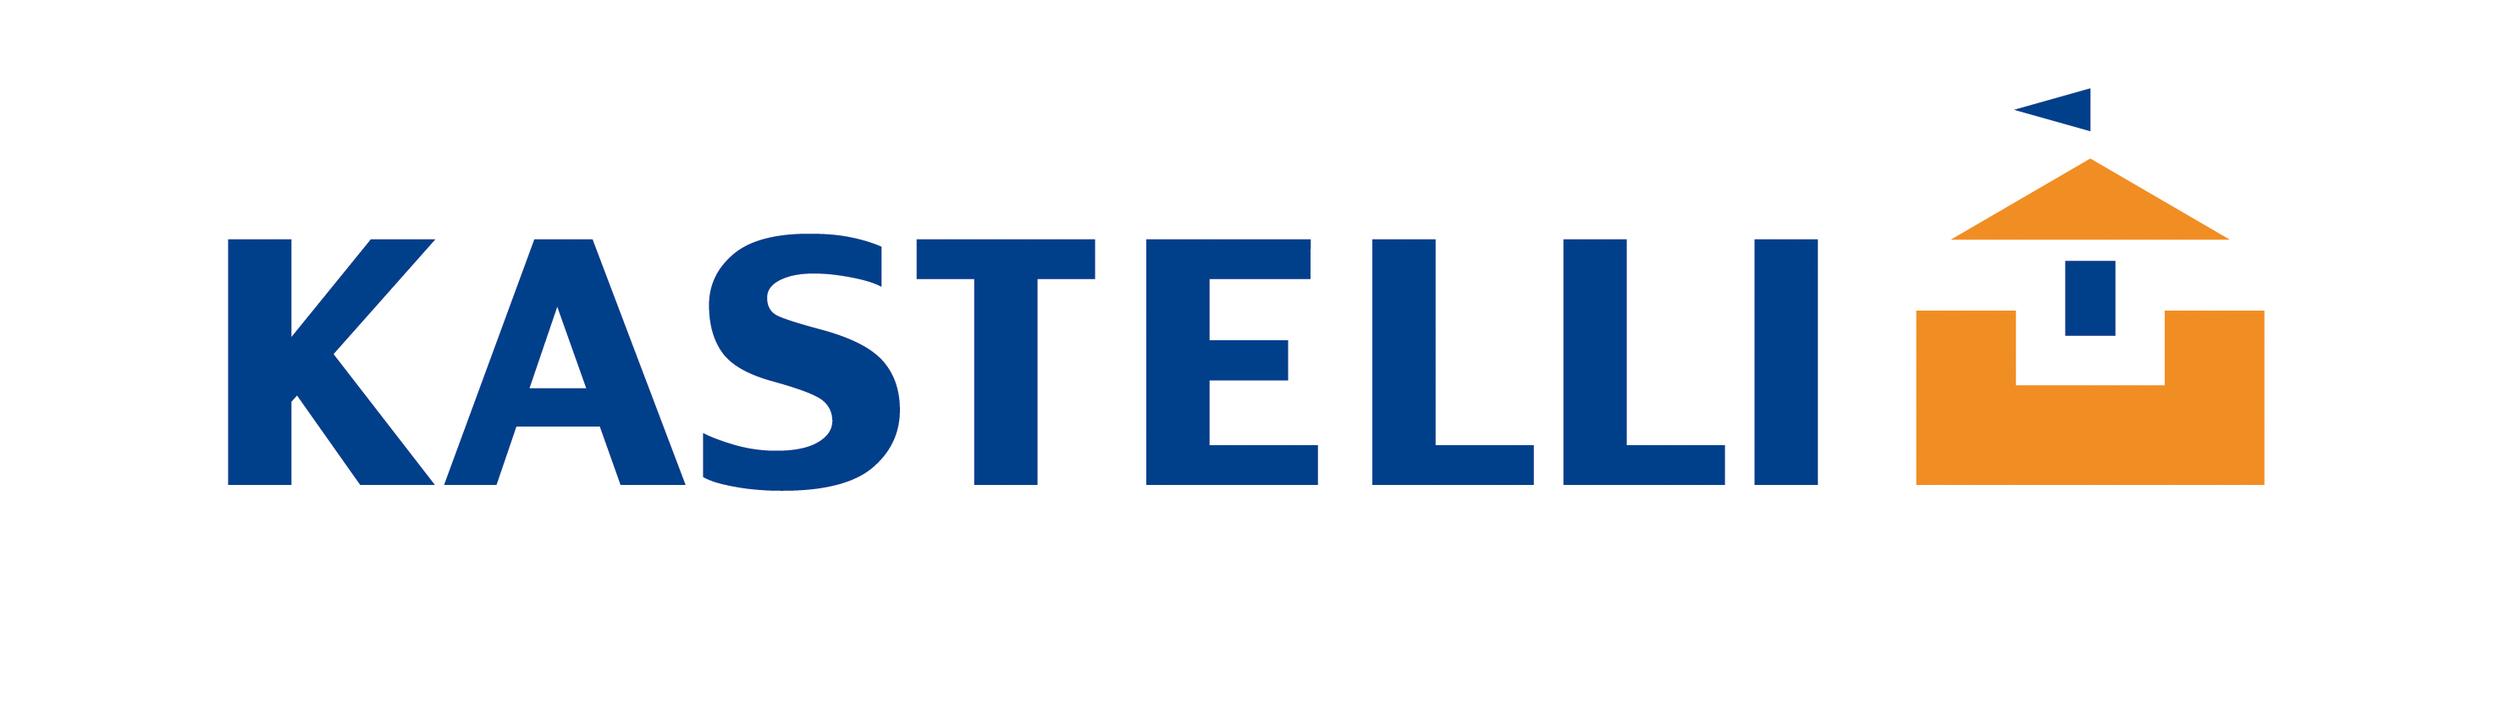 kastelli_logo_rgb.jpg